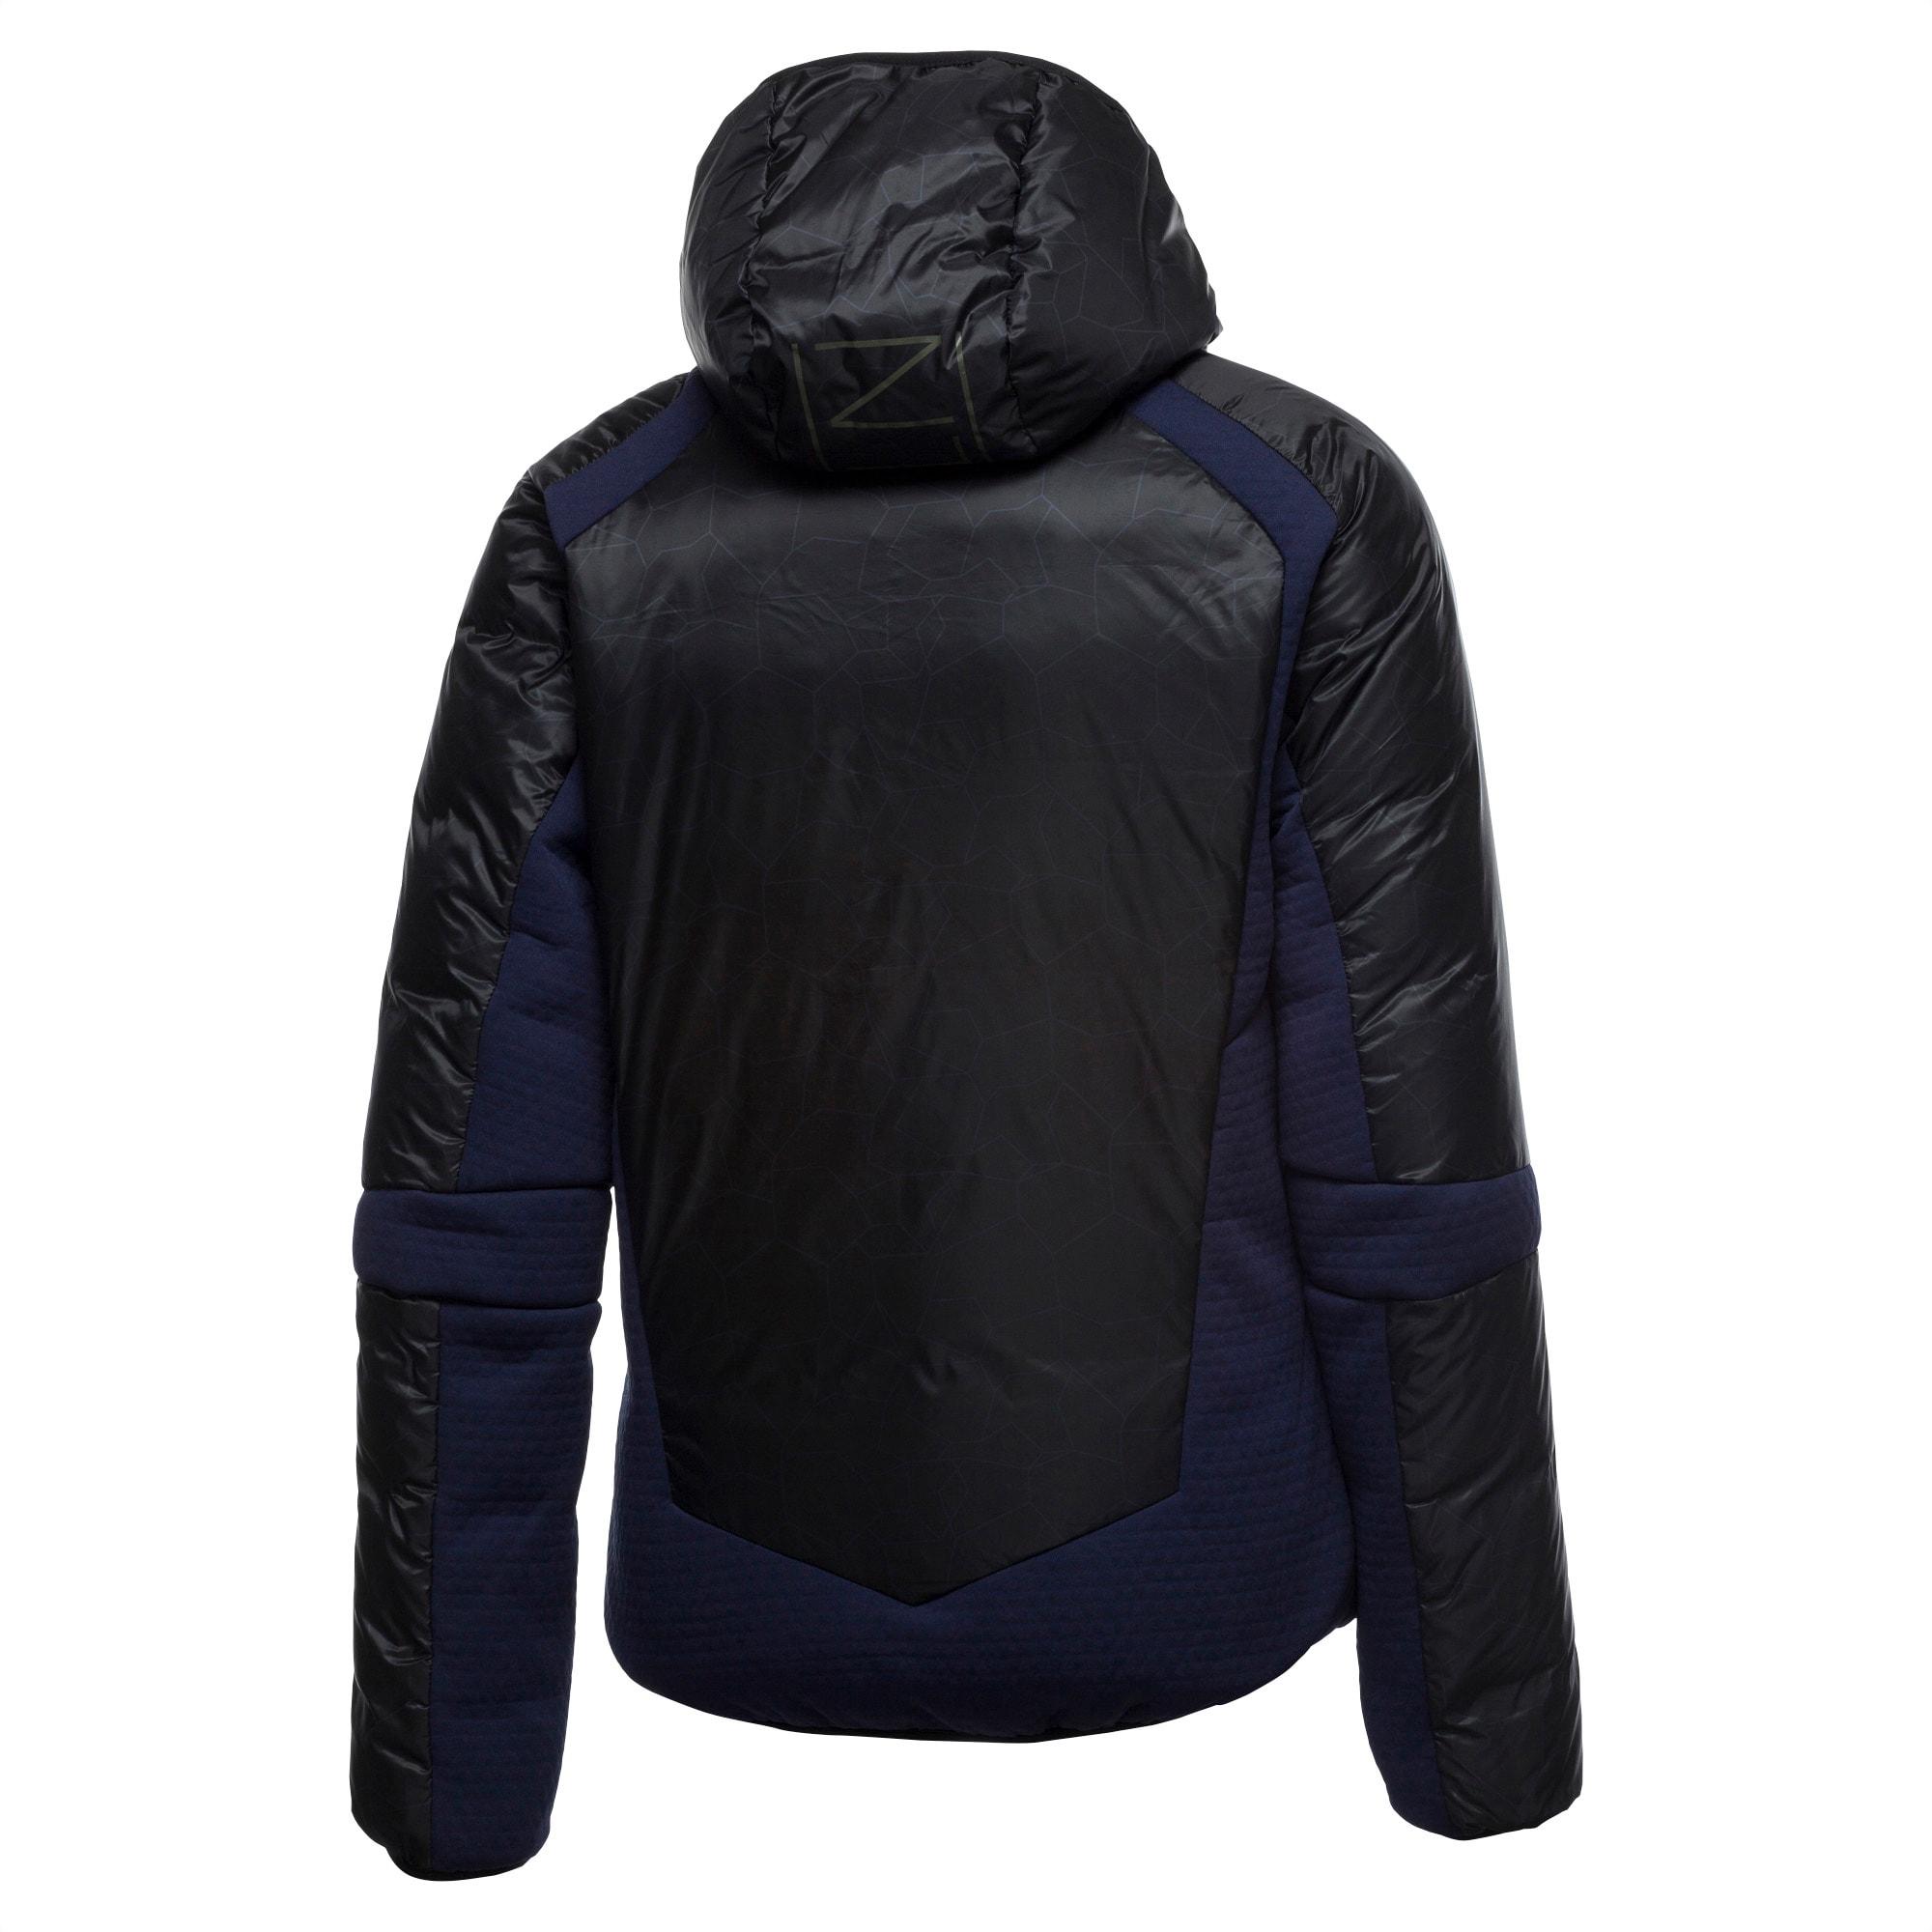 PUMA x STAPLE Men's Jacket